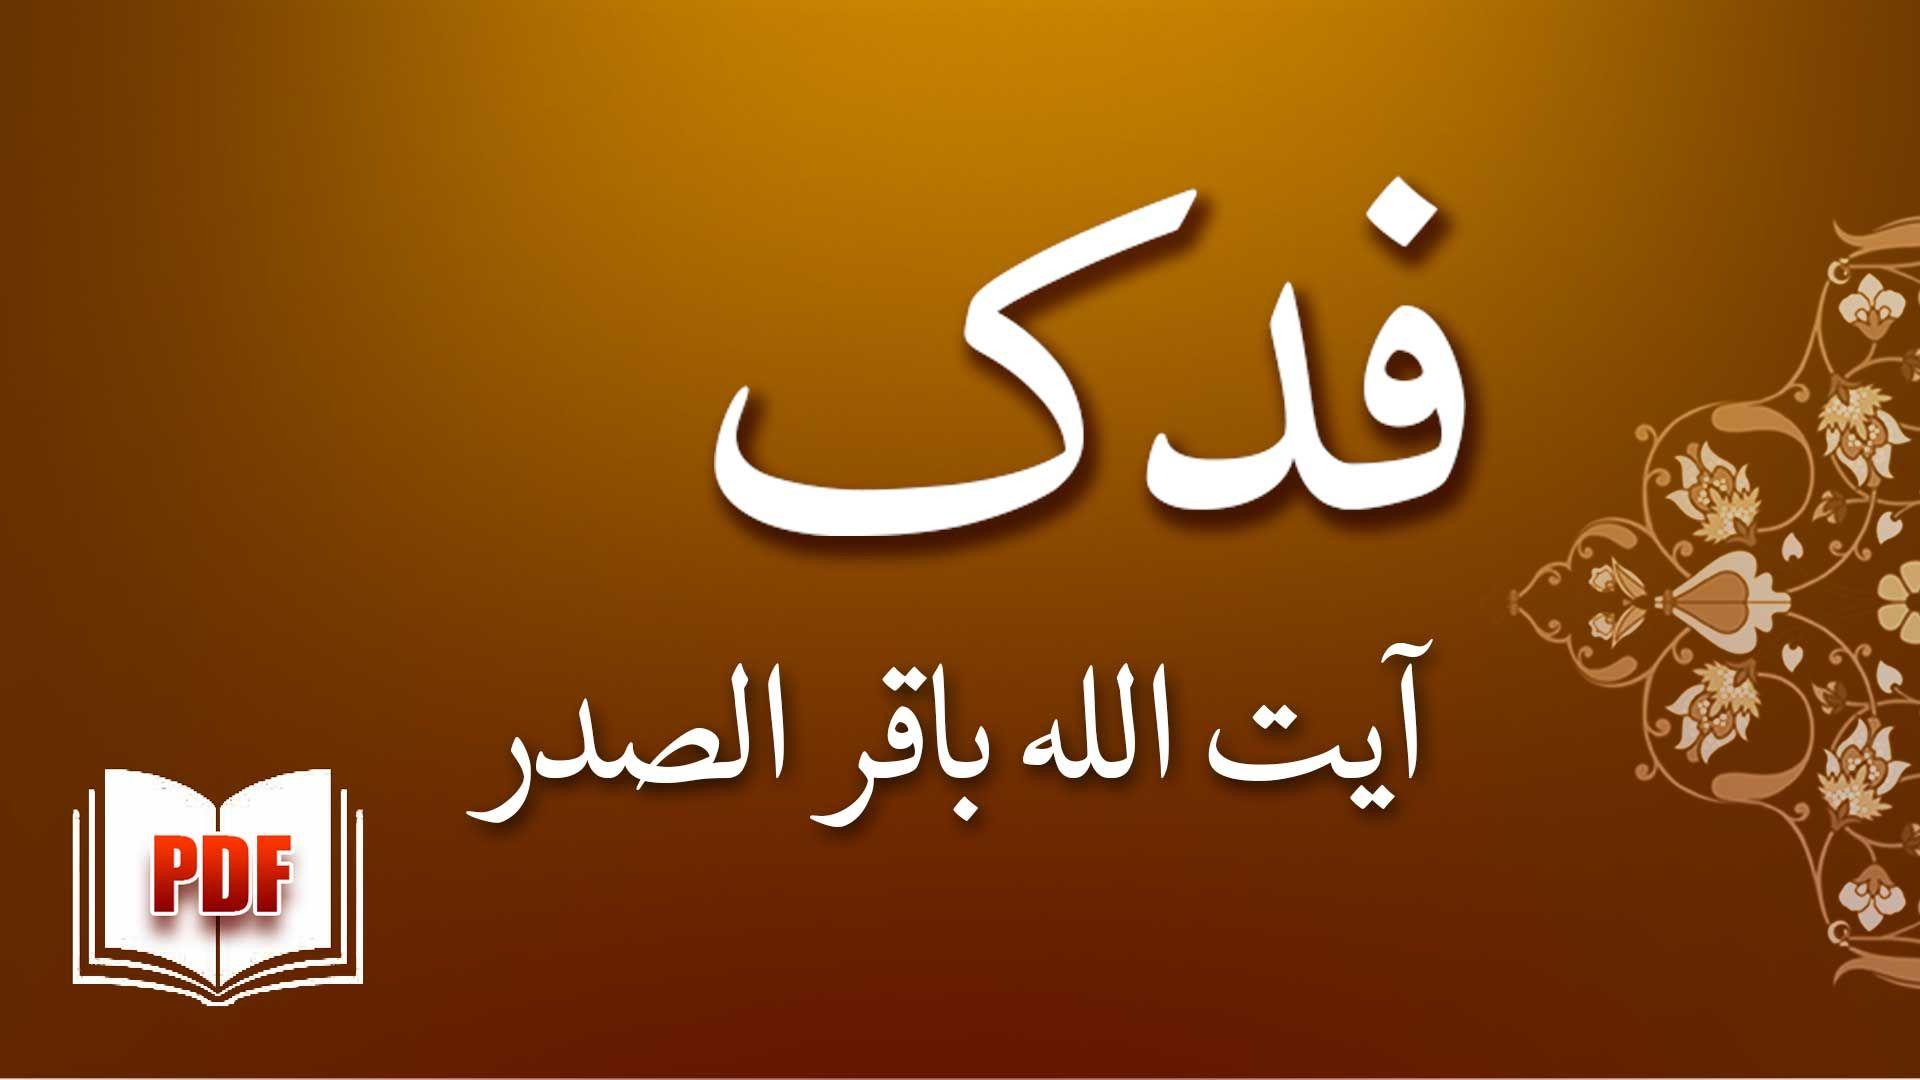 فدک آیت اللہ باقر الصدر Arabic Calligraphy Sayings Calligraphy